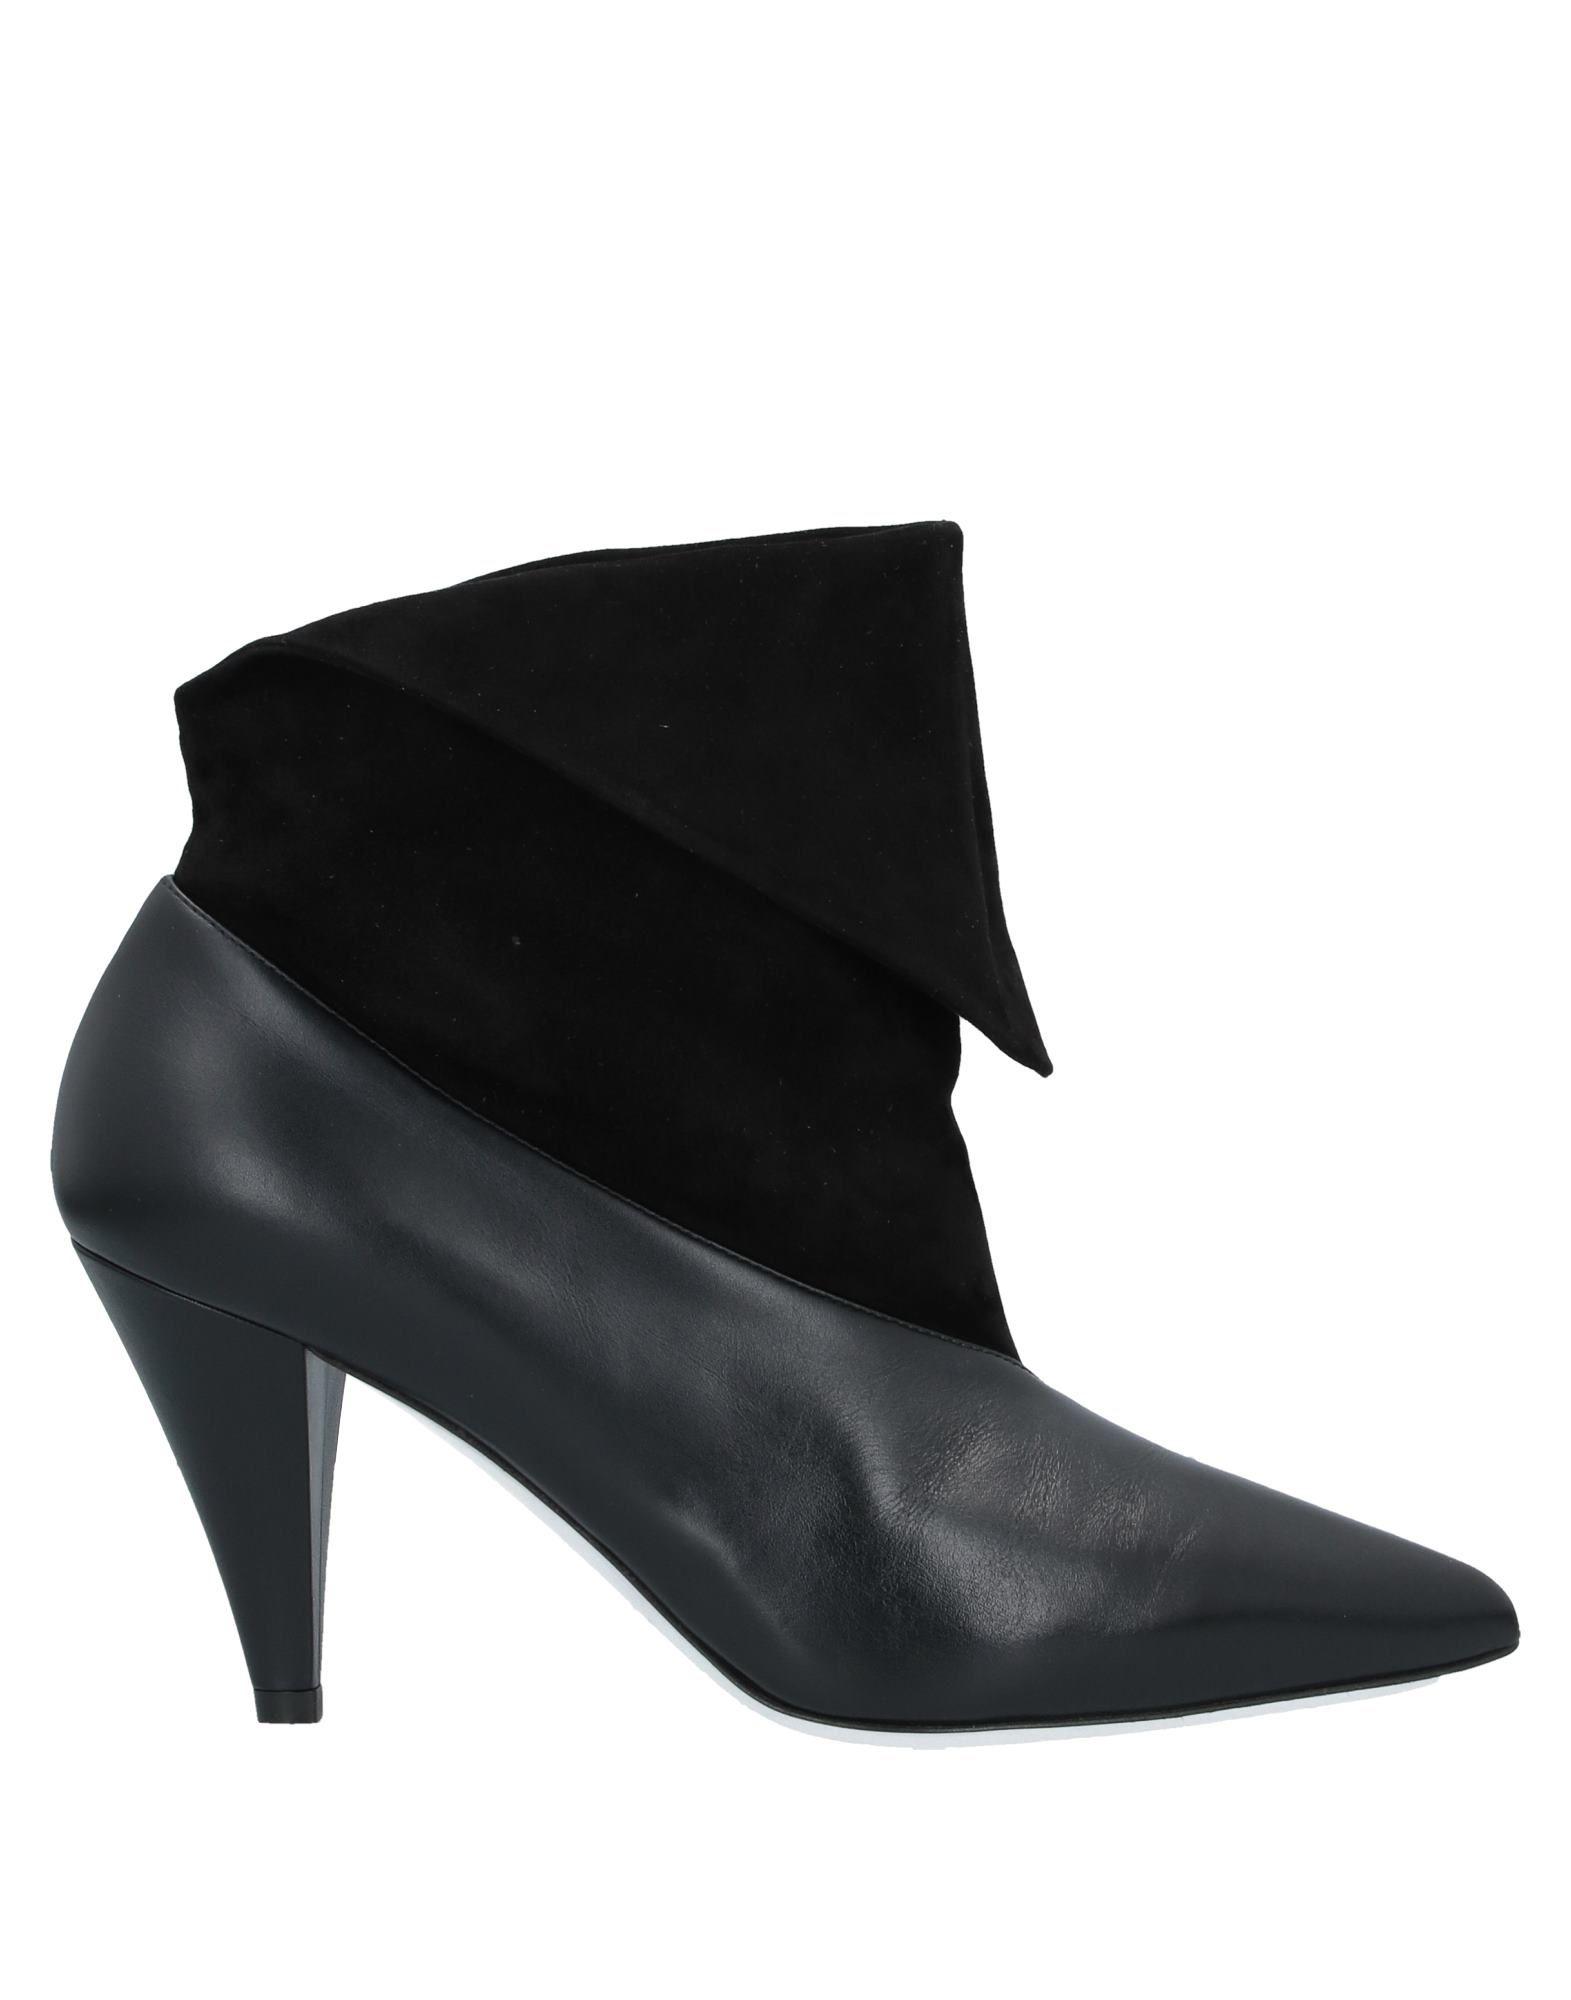 Stivaletti Givenchy damen - 11712718KO